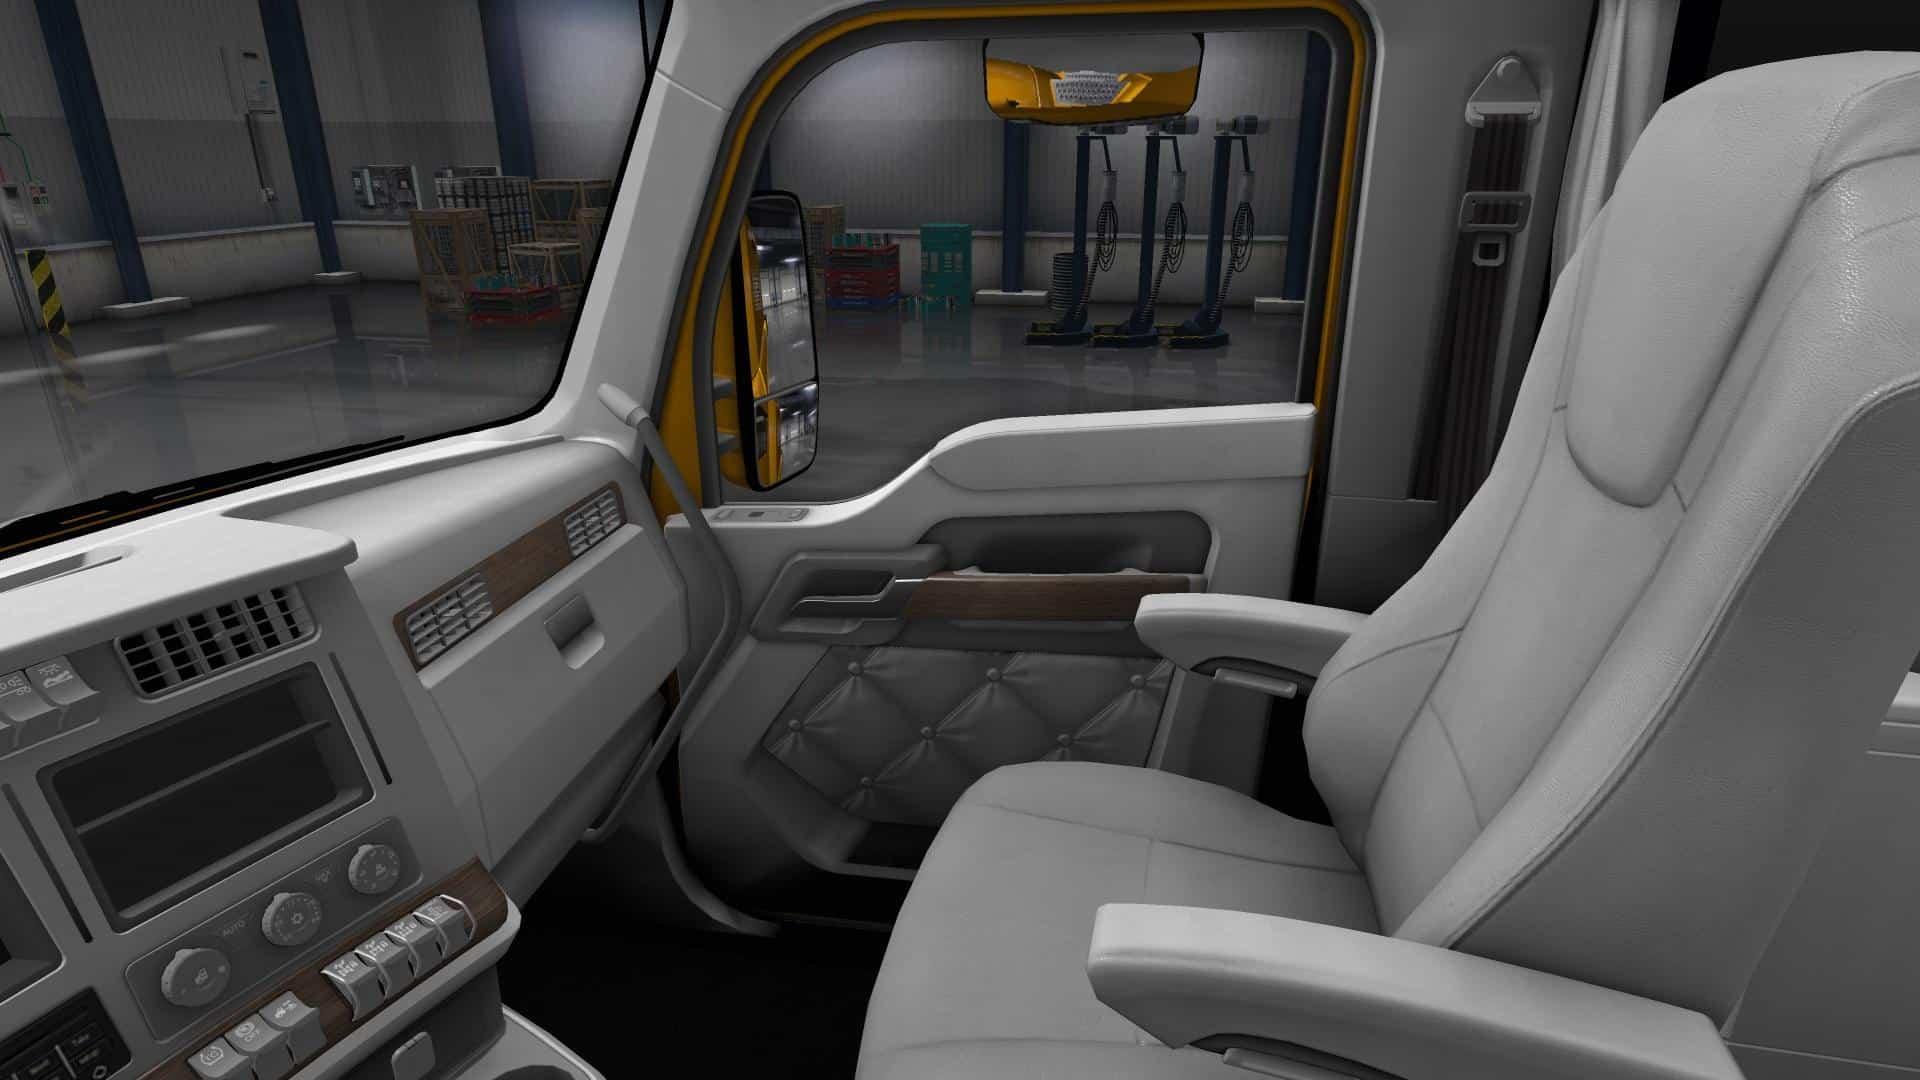 Kenworth T680 White Gauges Truck Interior V1 2 American Truck Simulator Mod Ats Mod